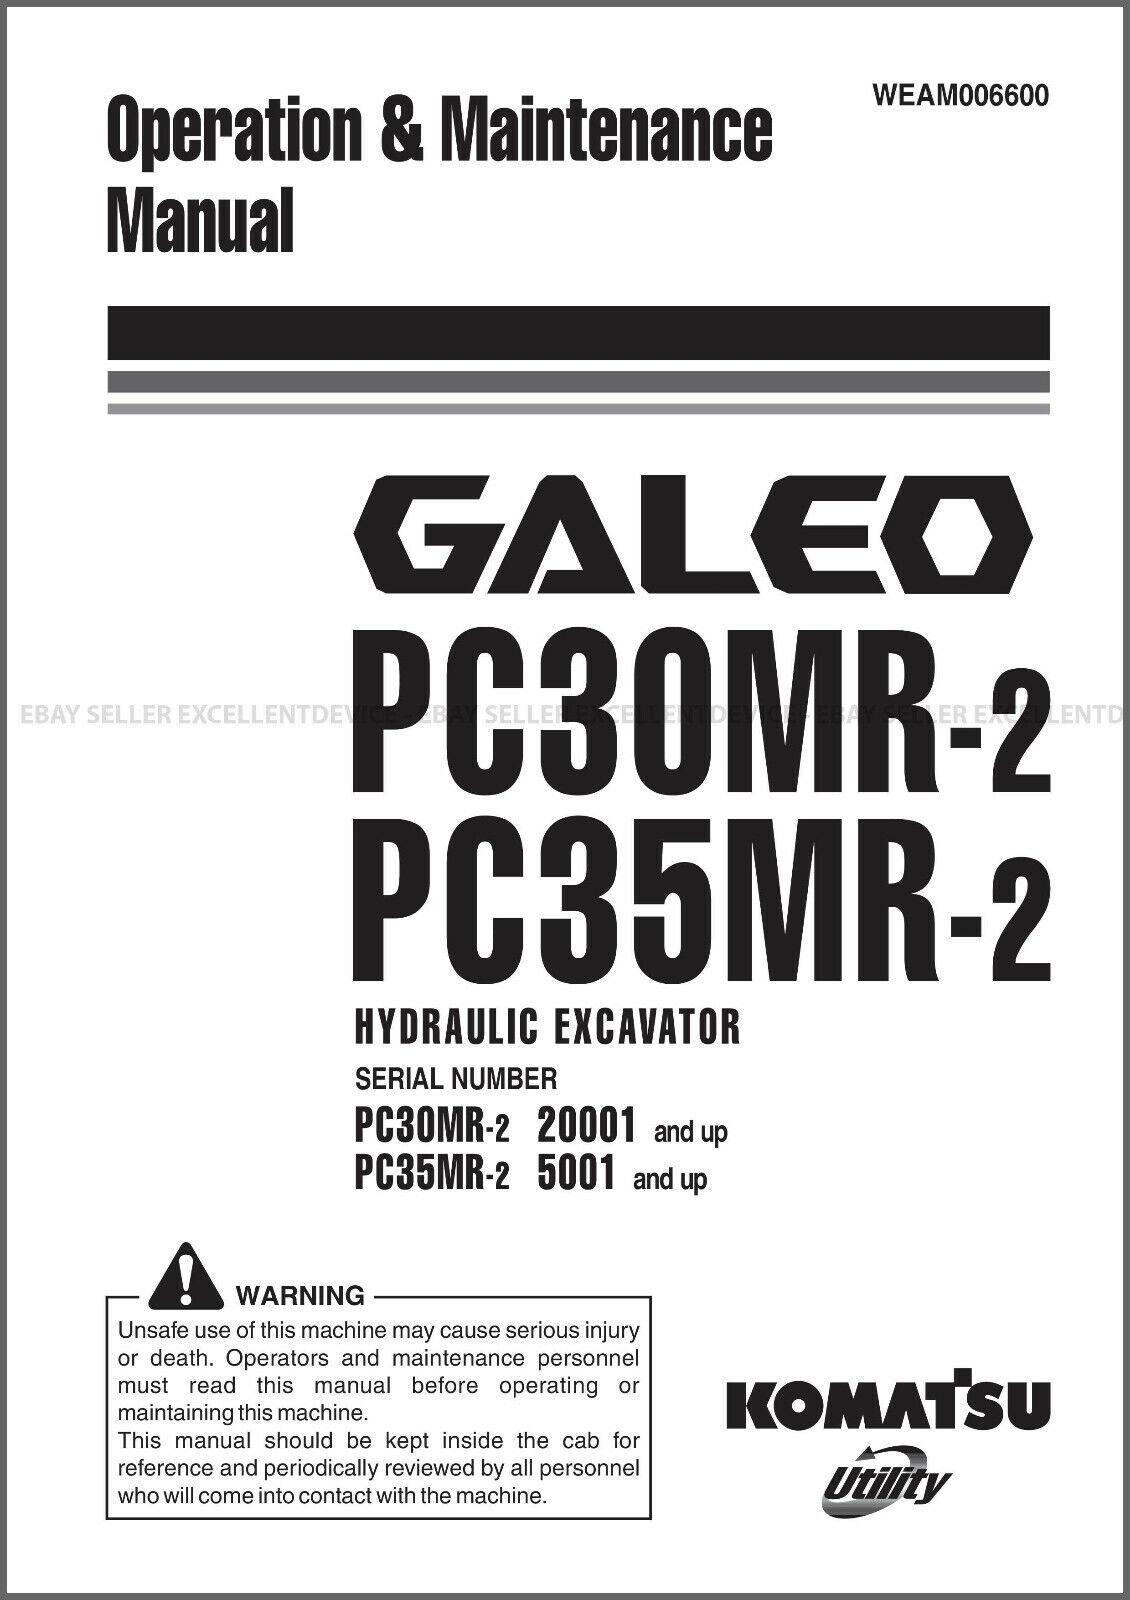 Komatsu Galeo PC30MR-2 PC35MR-2 Printed Operation